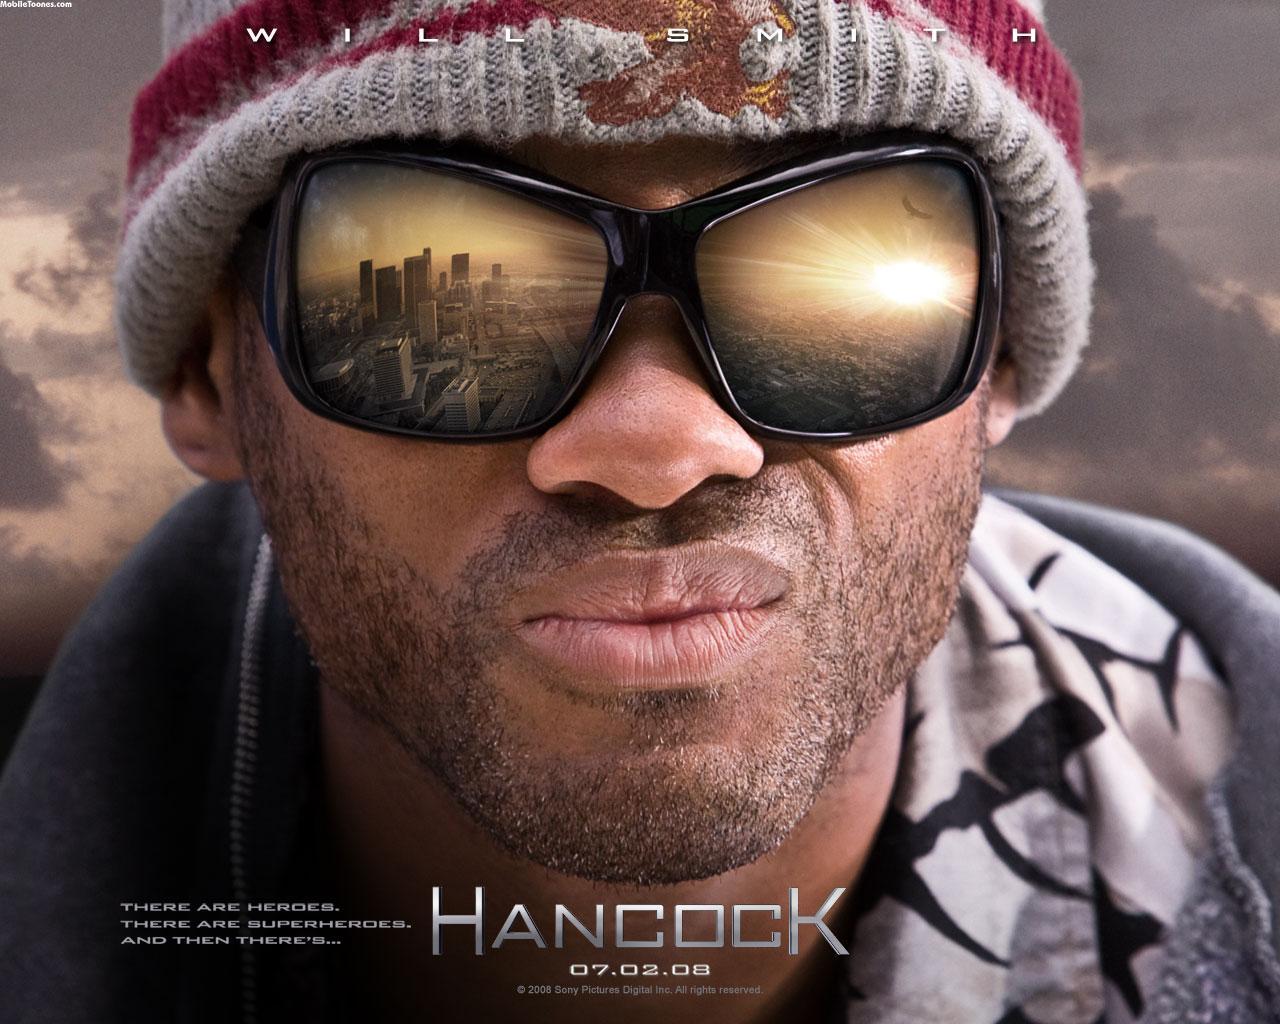 HANCOCK Mobile Wallpaper